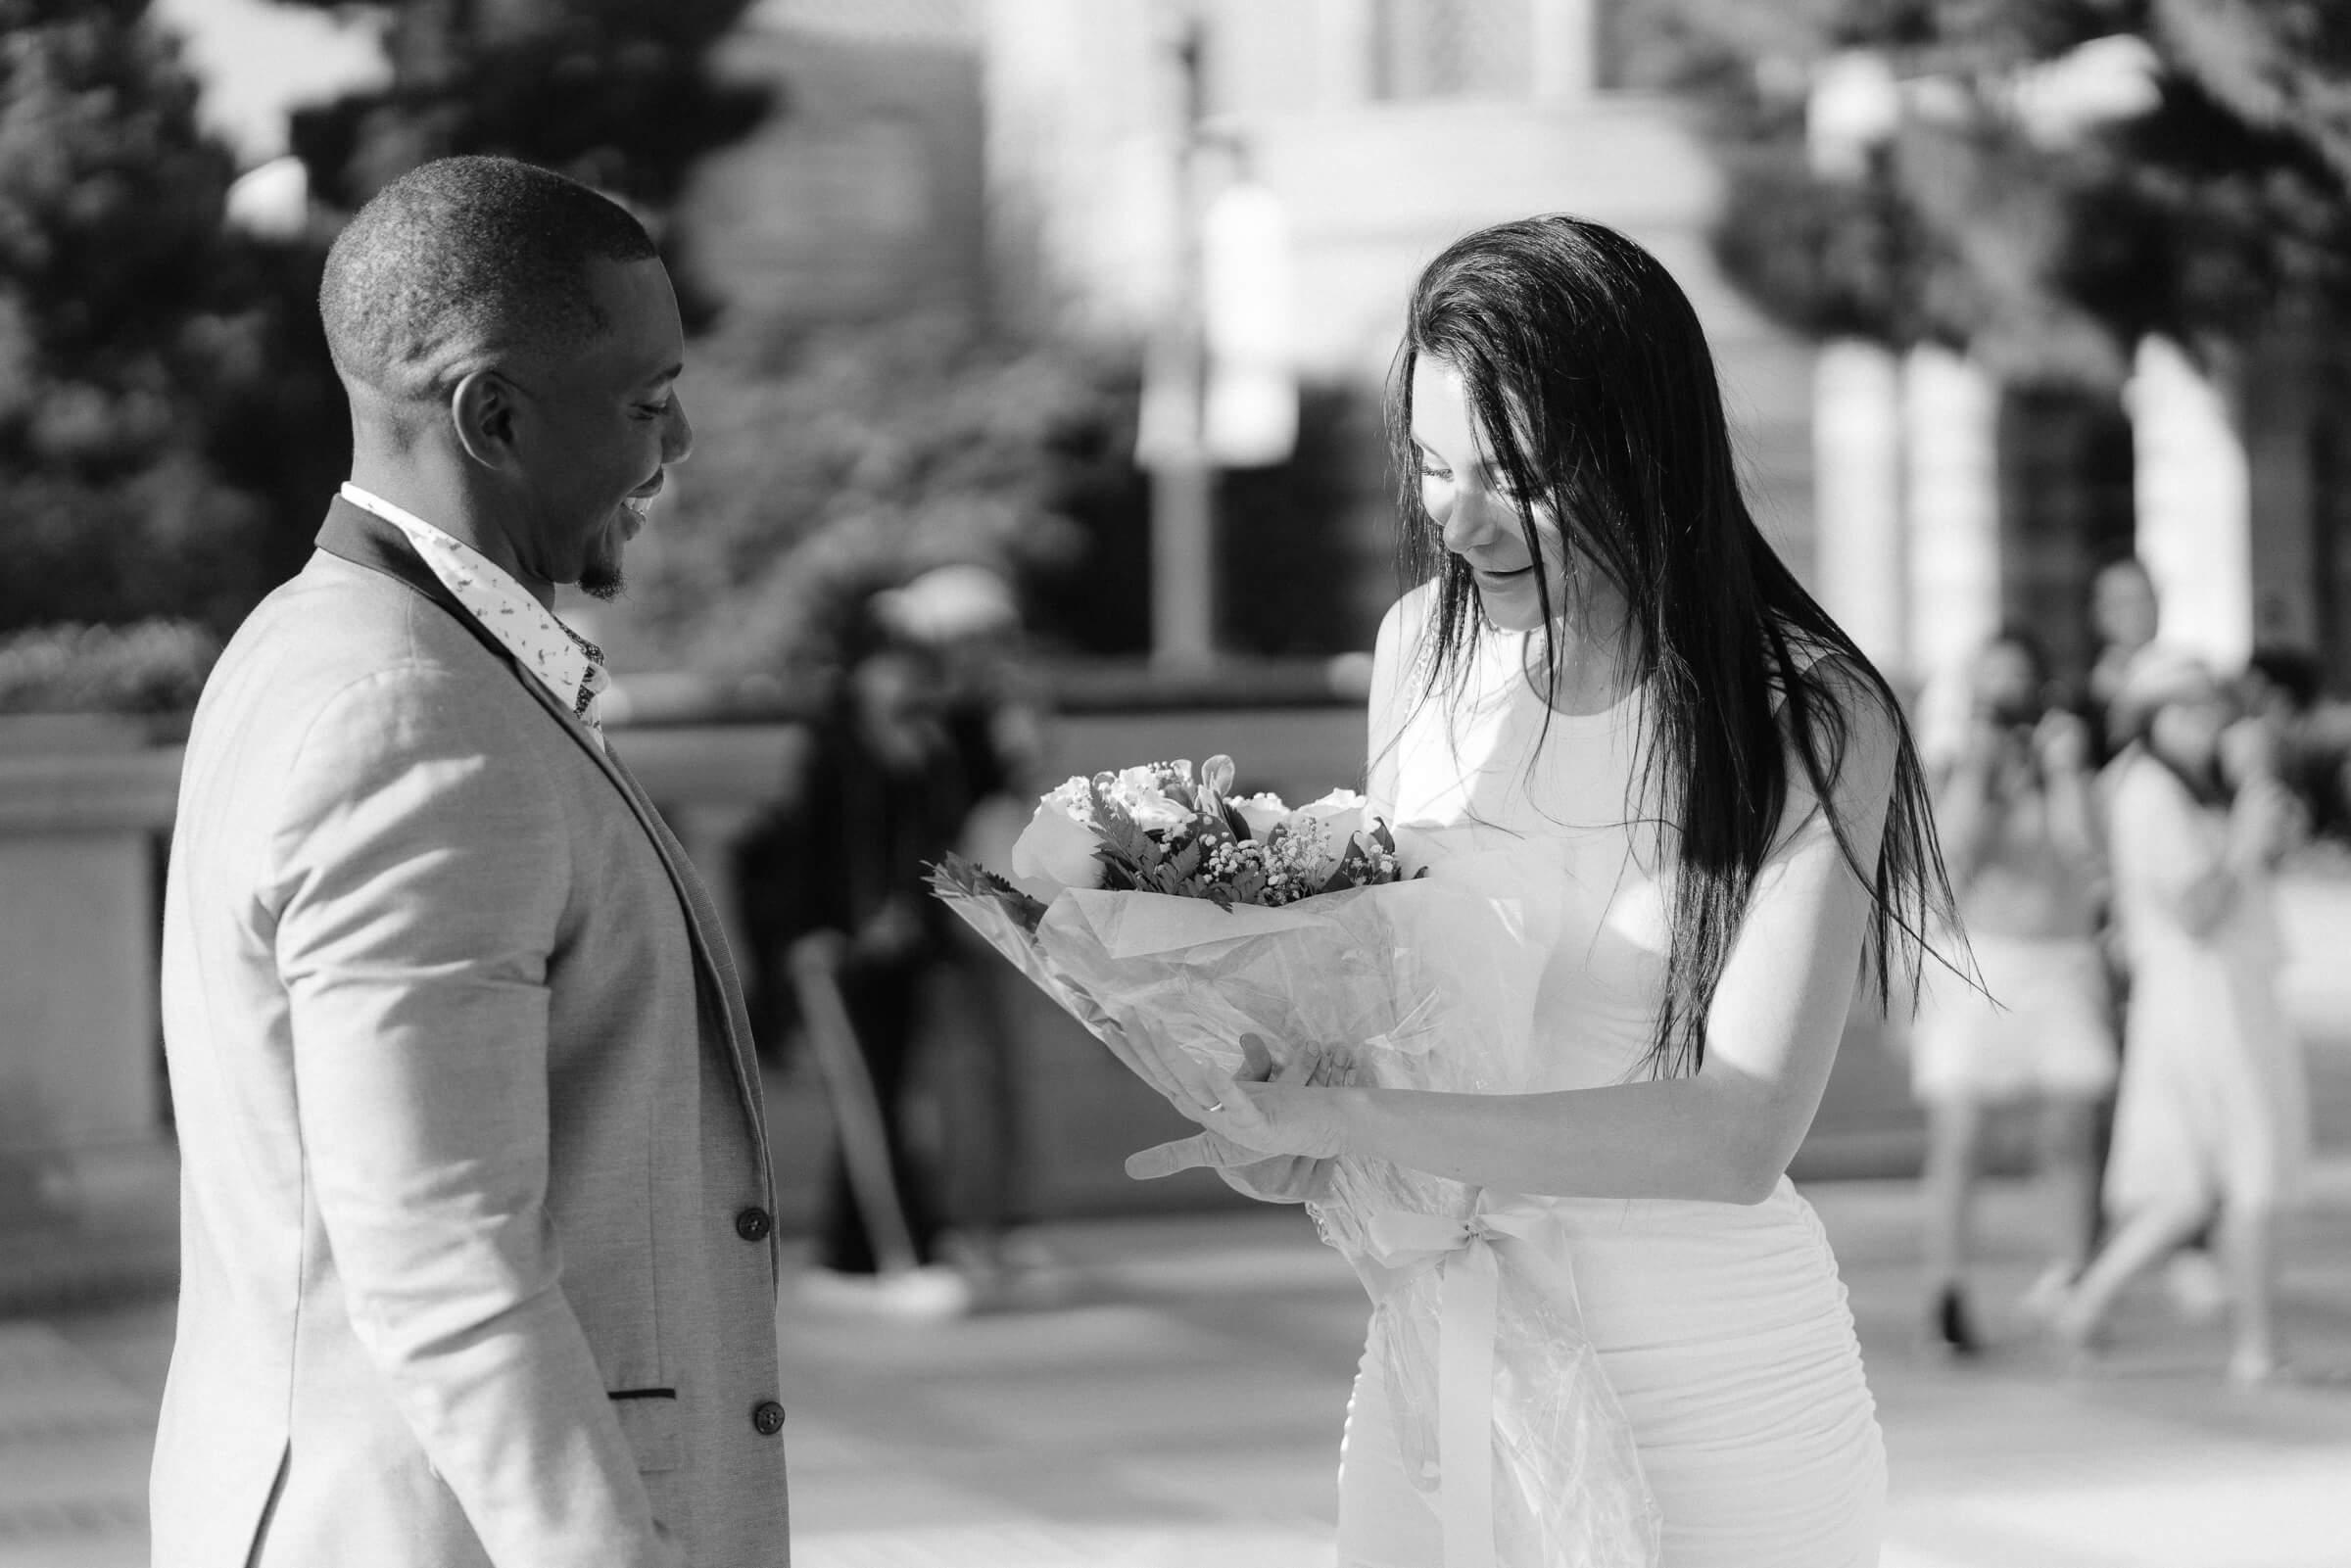 ucla-los-angeles-proposal-photographer-18.jpg